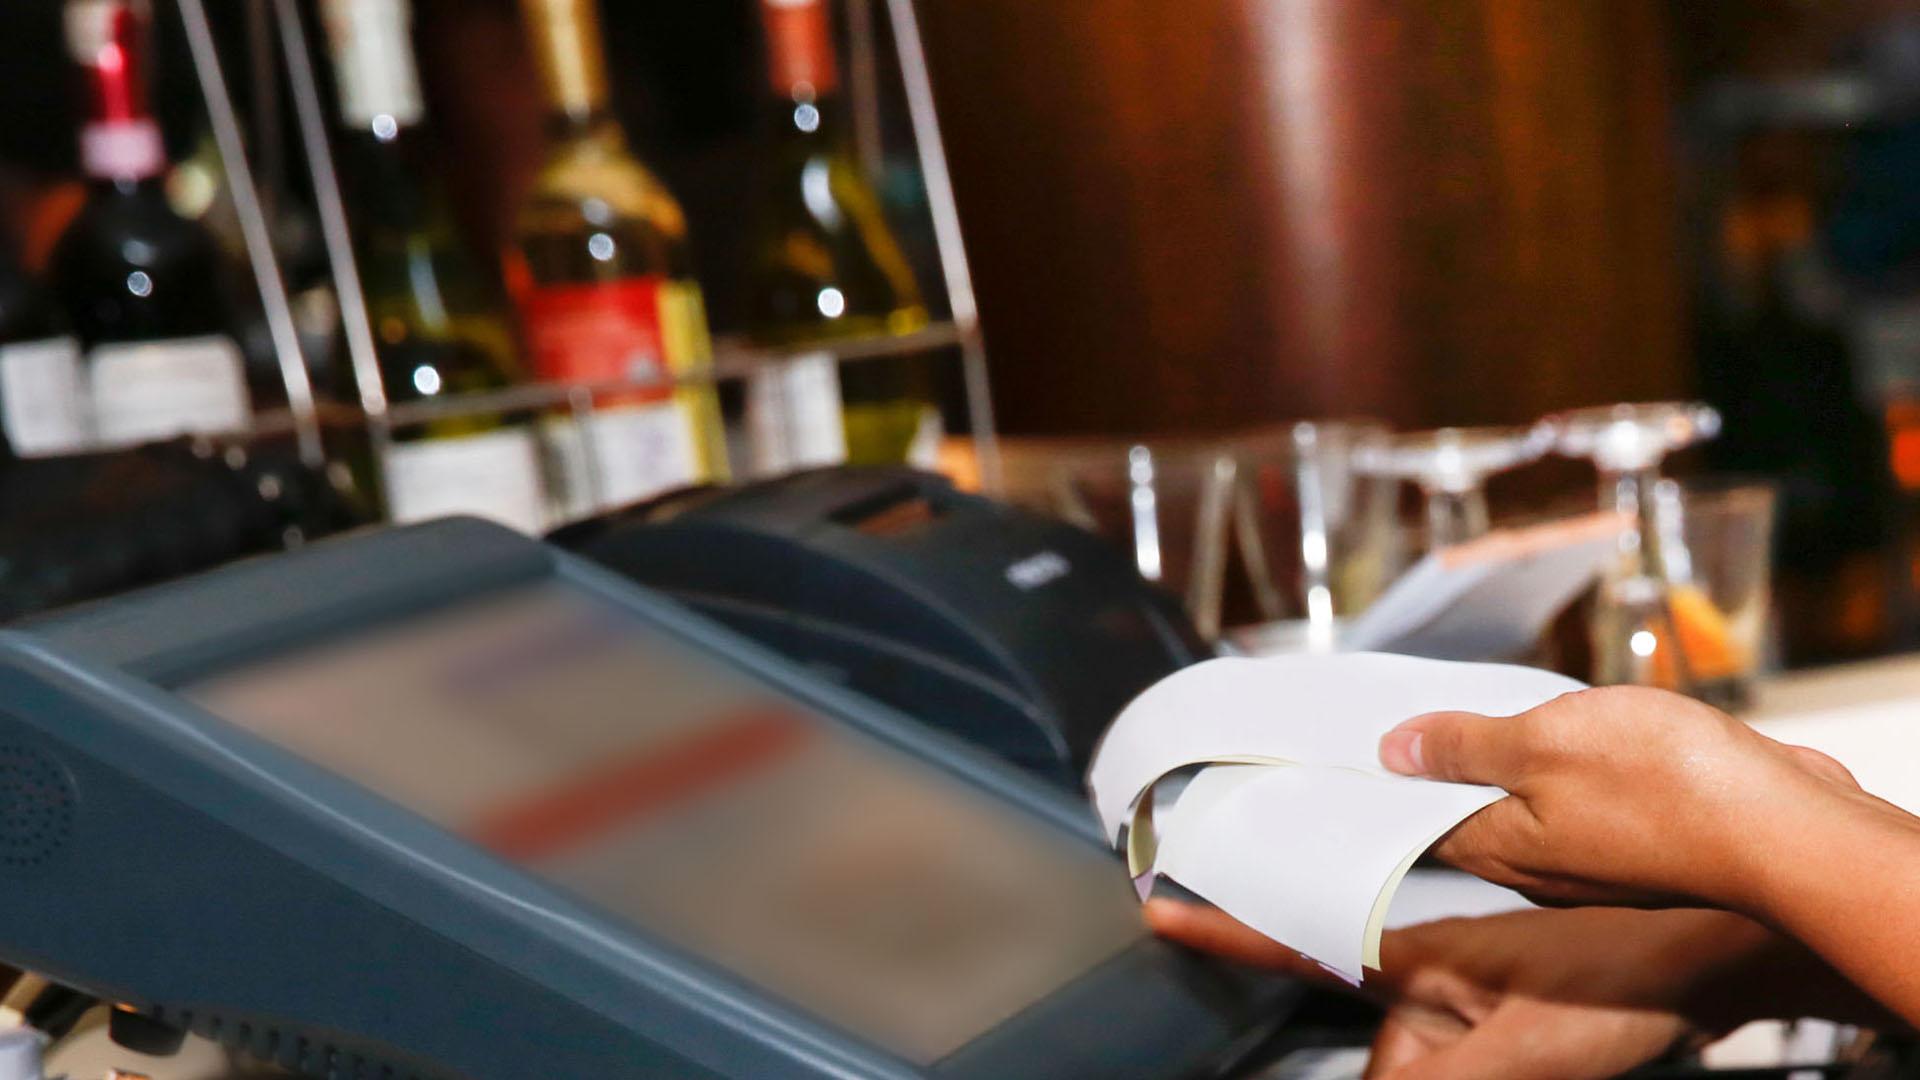 Bill calculation in a restaurant